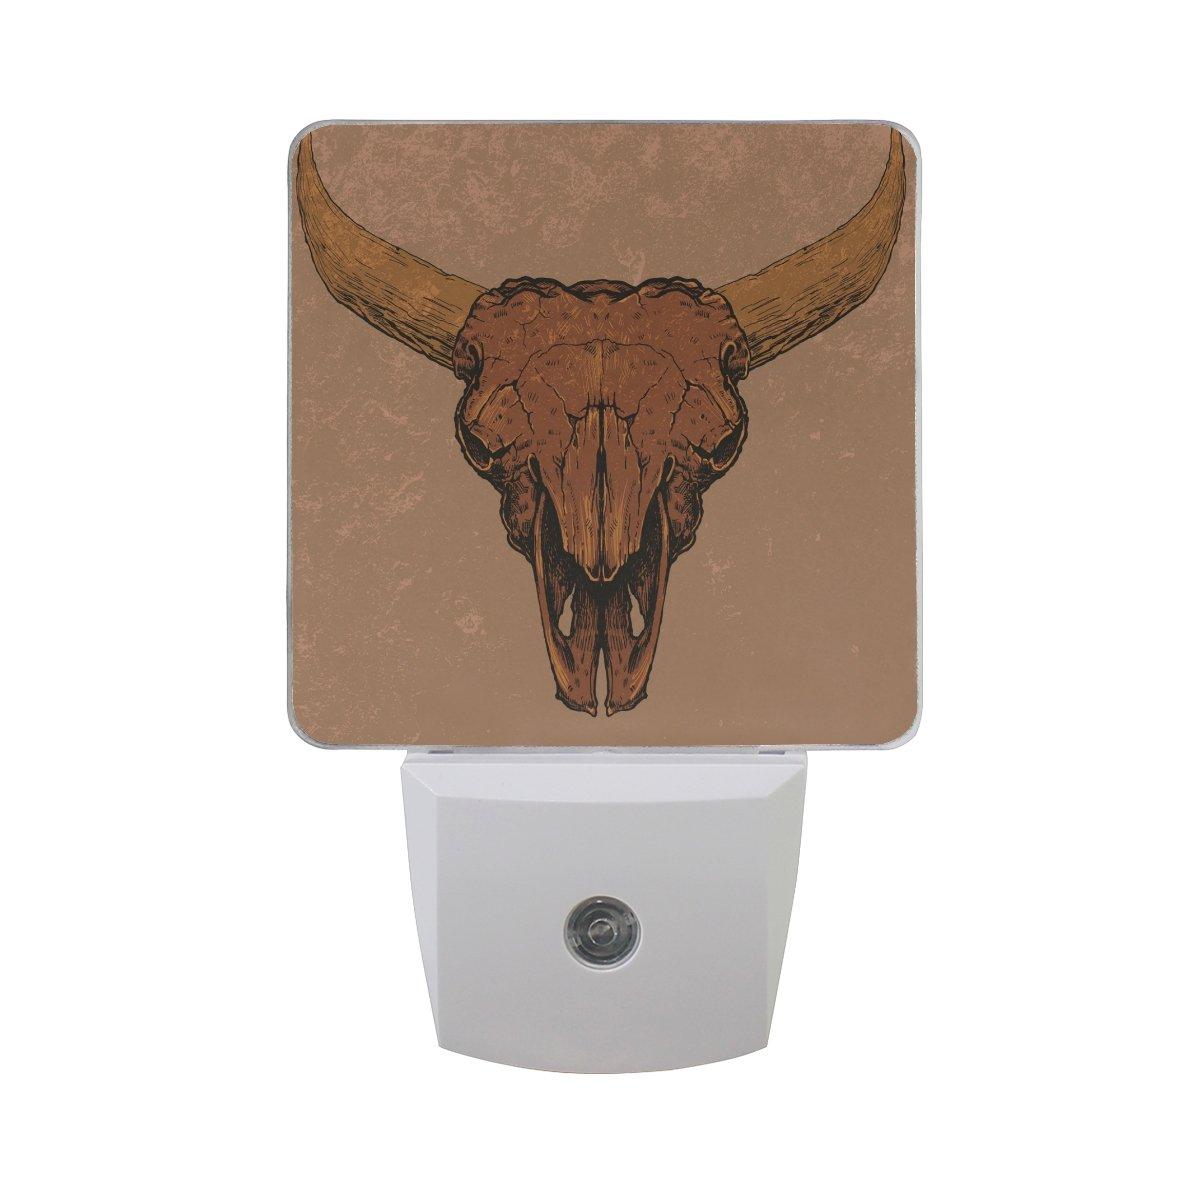 Vintage Cow Skull White LED Sensor Night Light Super Bright Power Dusk To Dawn Sensor Bedroom Kitchen Bathroom Hallway Toilet Stairs Energy Efficient Compact(2 PACK)